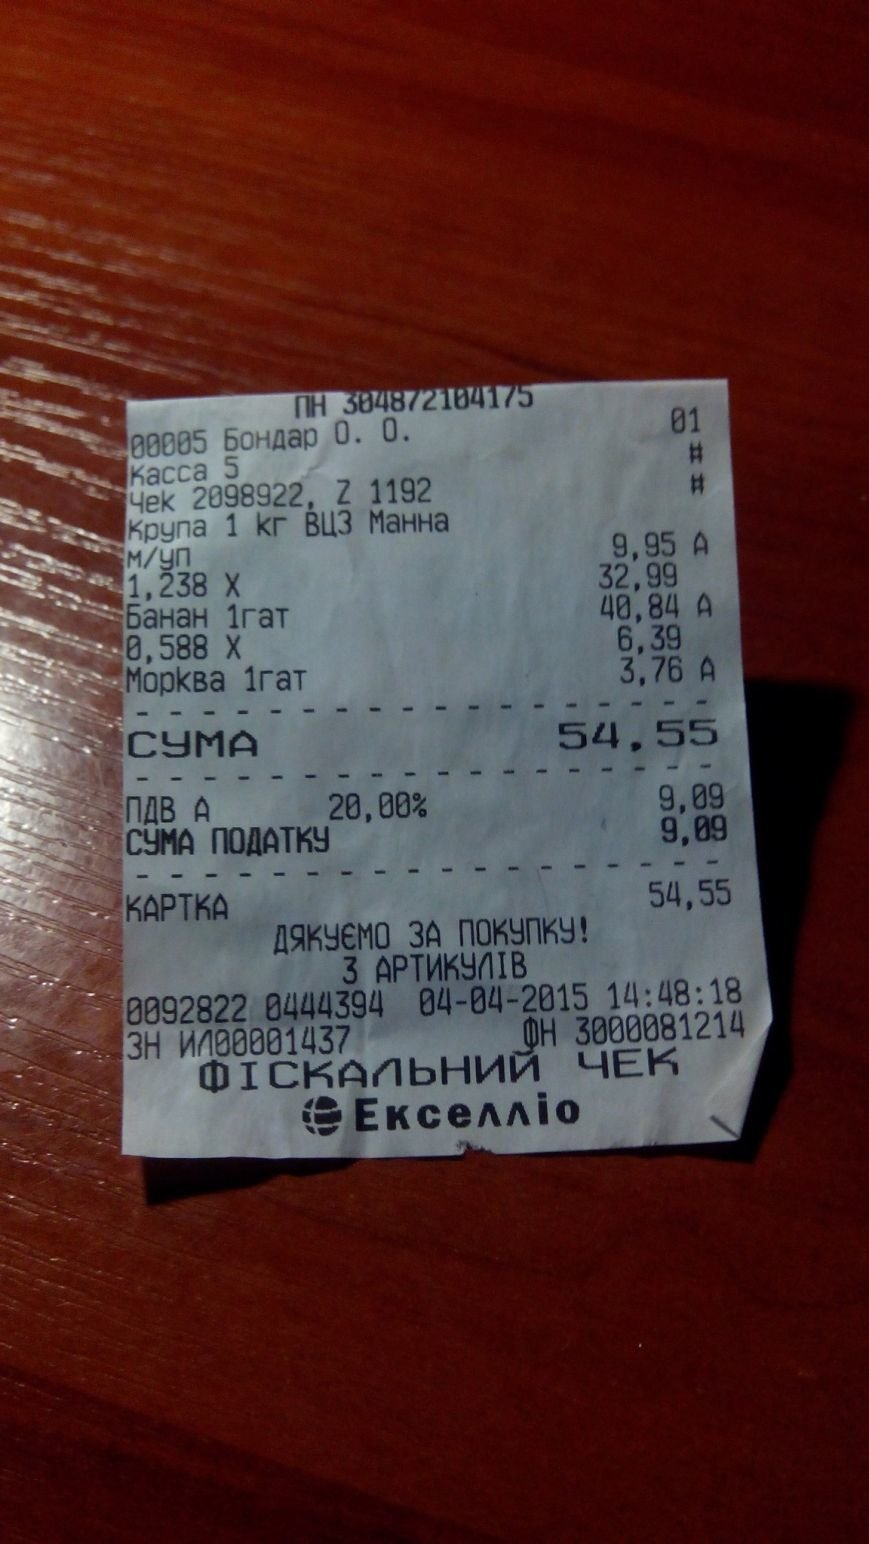 Обзор цен на продукты в Днепропетровске (рынки и магазины) (фото) - фото 2